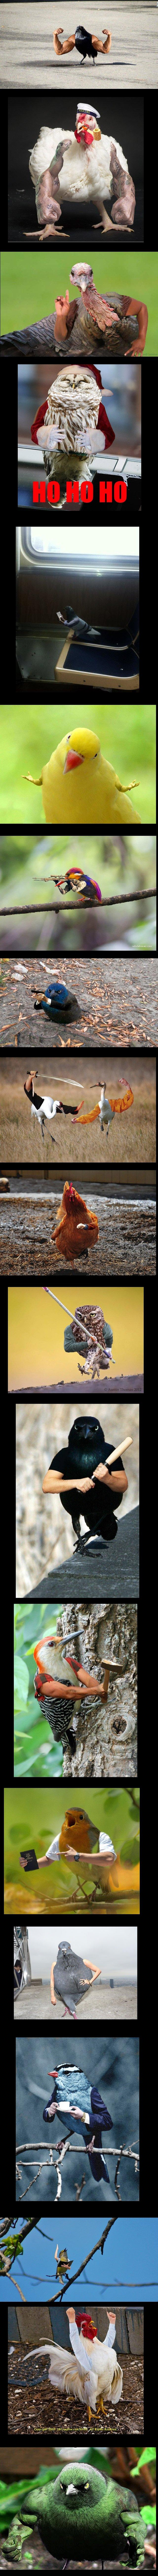 Bird with arms. . Bird with arms